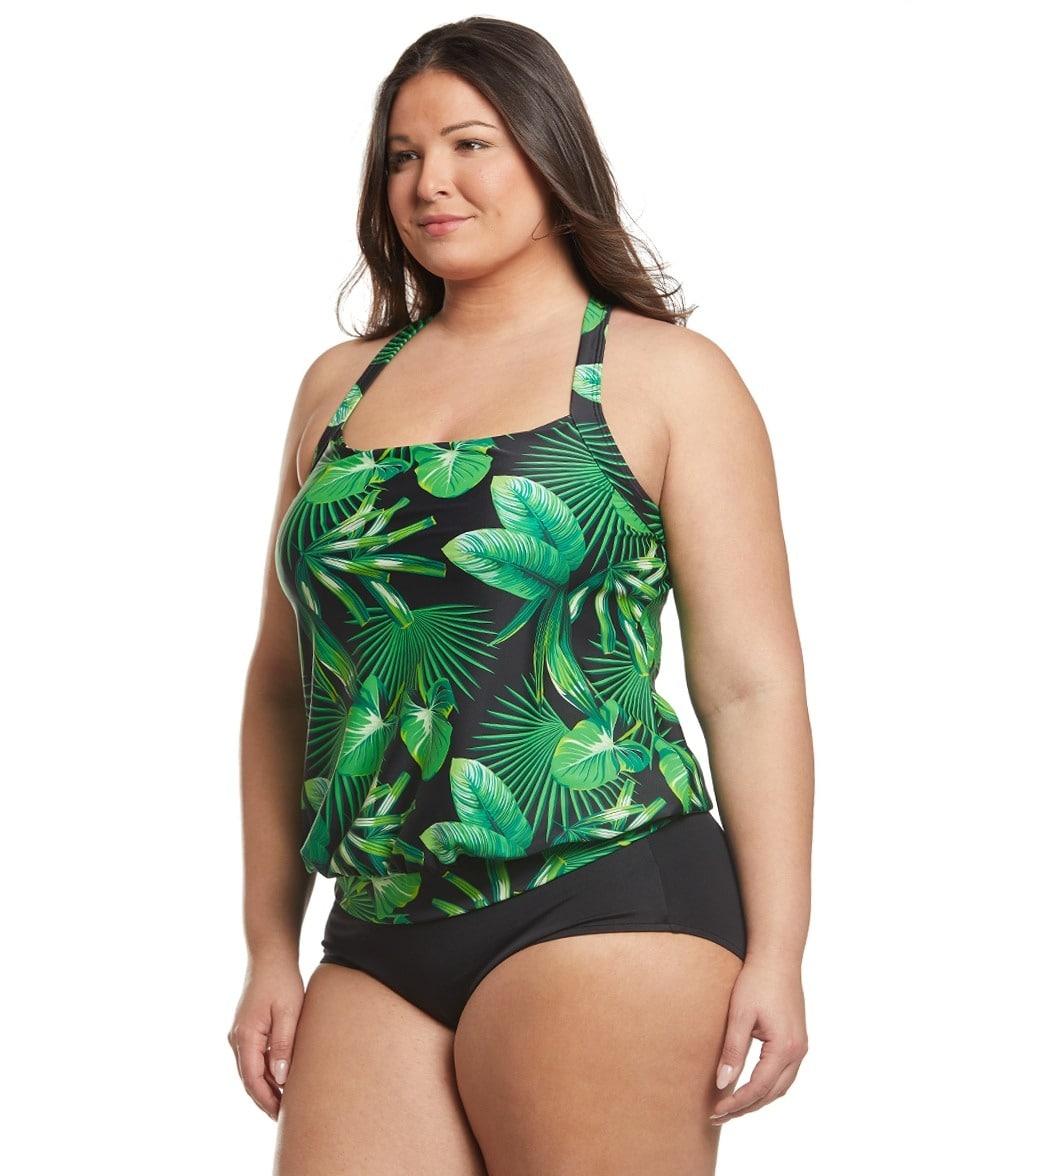 f5fc56da8a2 Sporti Plus Size Valentina Tropical Palm Blouson Tankini Top at ...